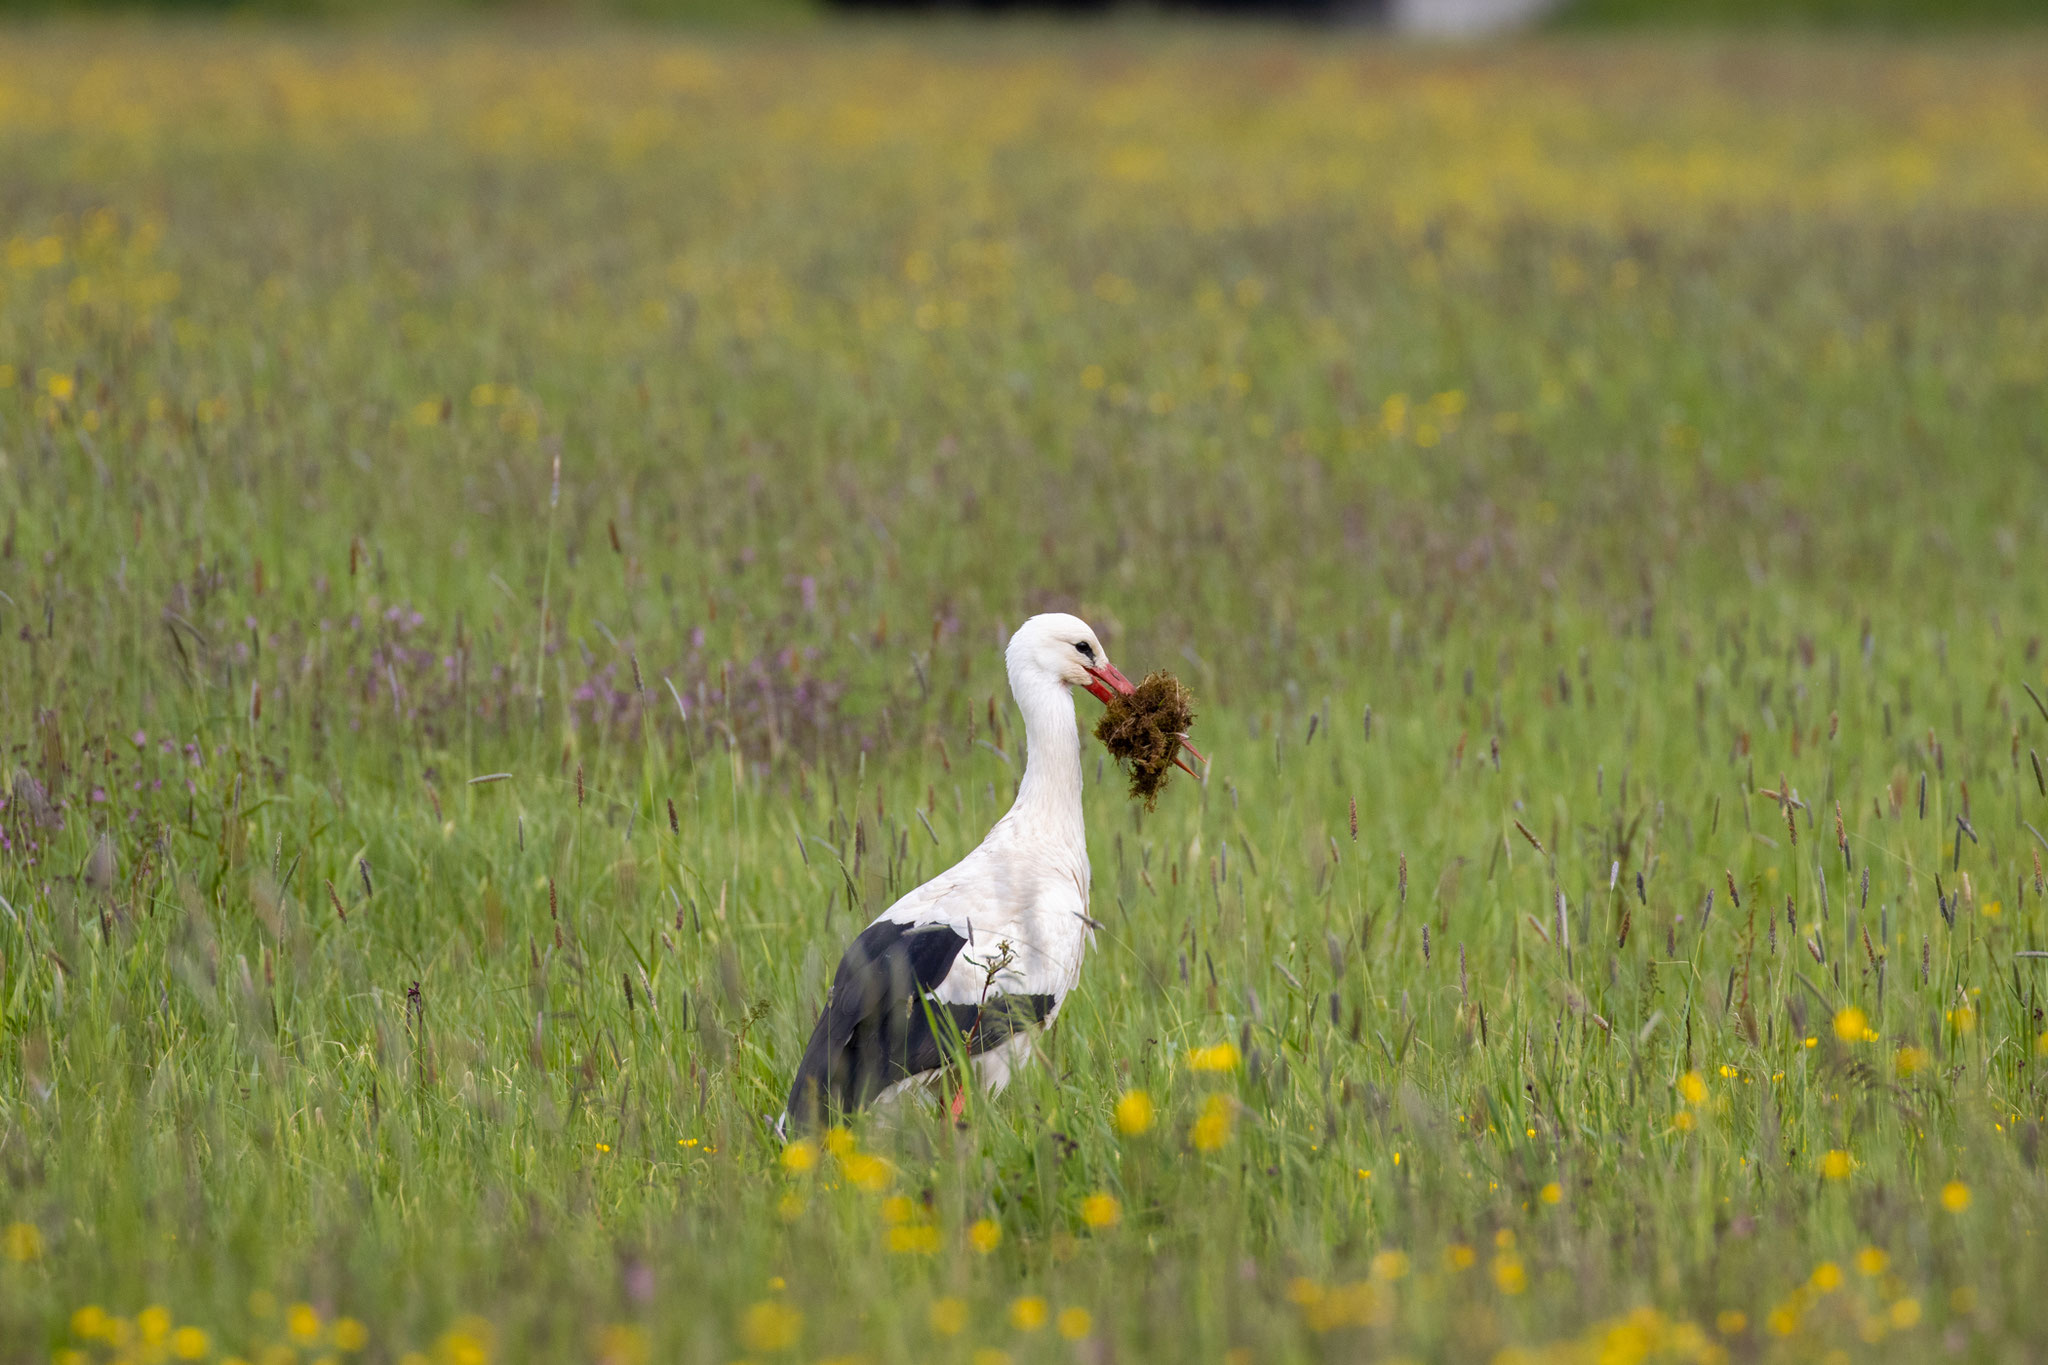 Storch mit Nistmaterial im Schnabel am 20.05.21 (Foto: H. Budig)